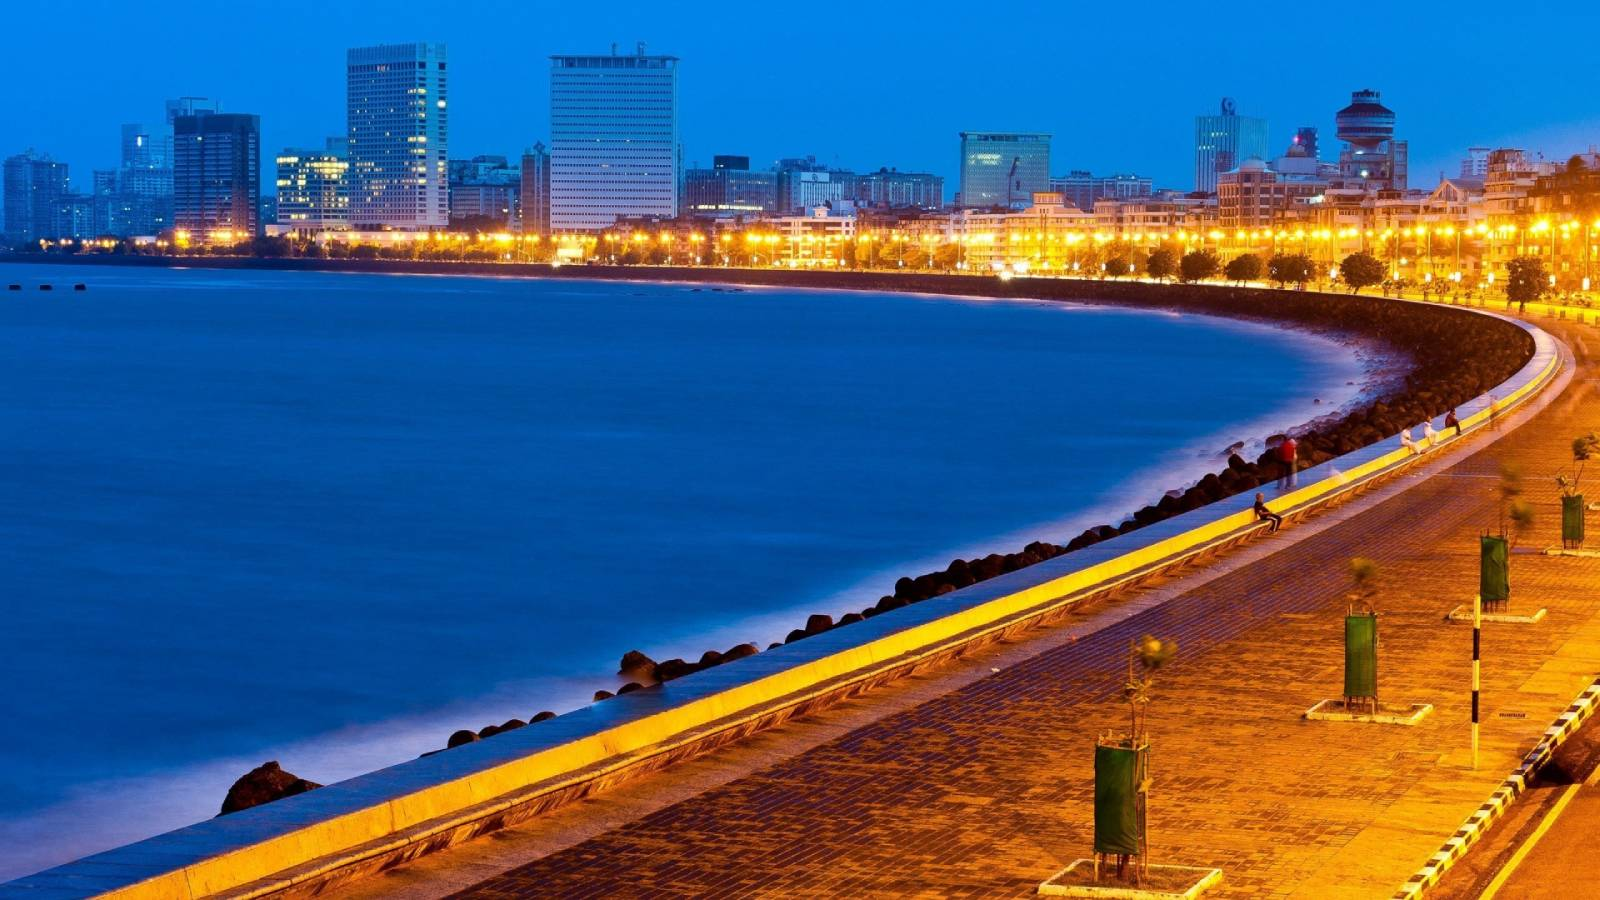 marine drive 1 - The Ambassador | Heritage Hotels in Mumbai, Aurangabad, Chennai - Citybite